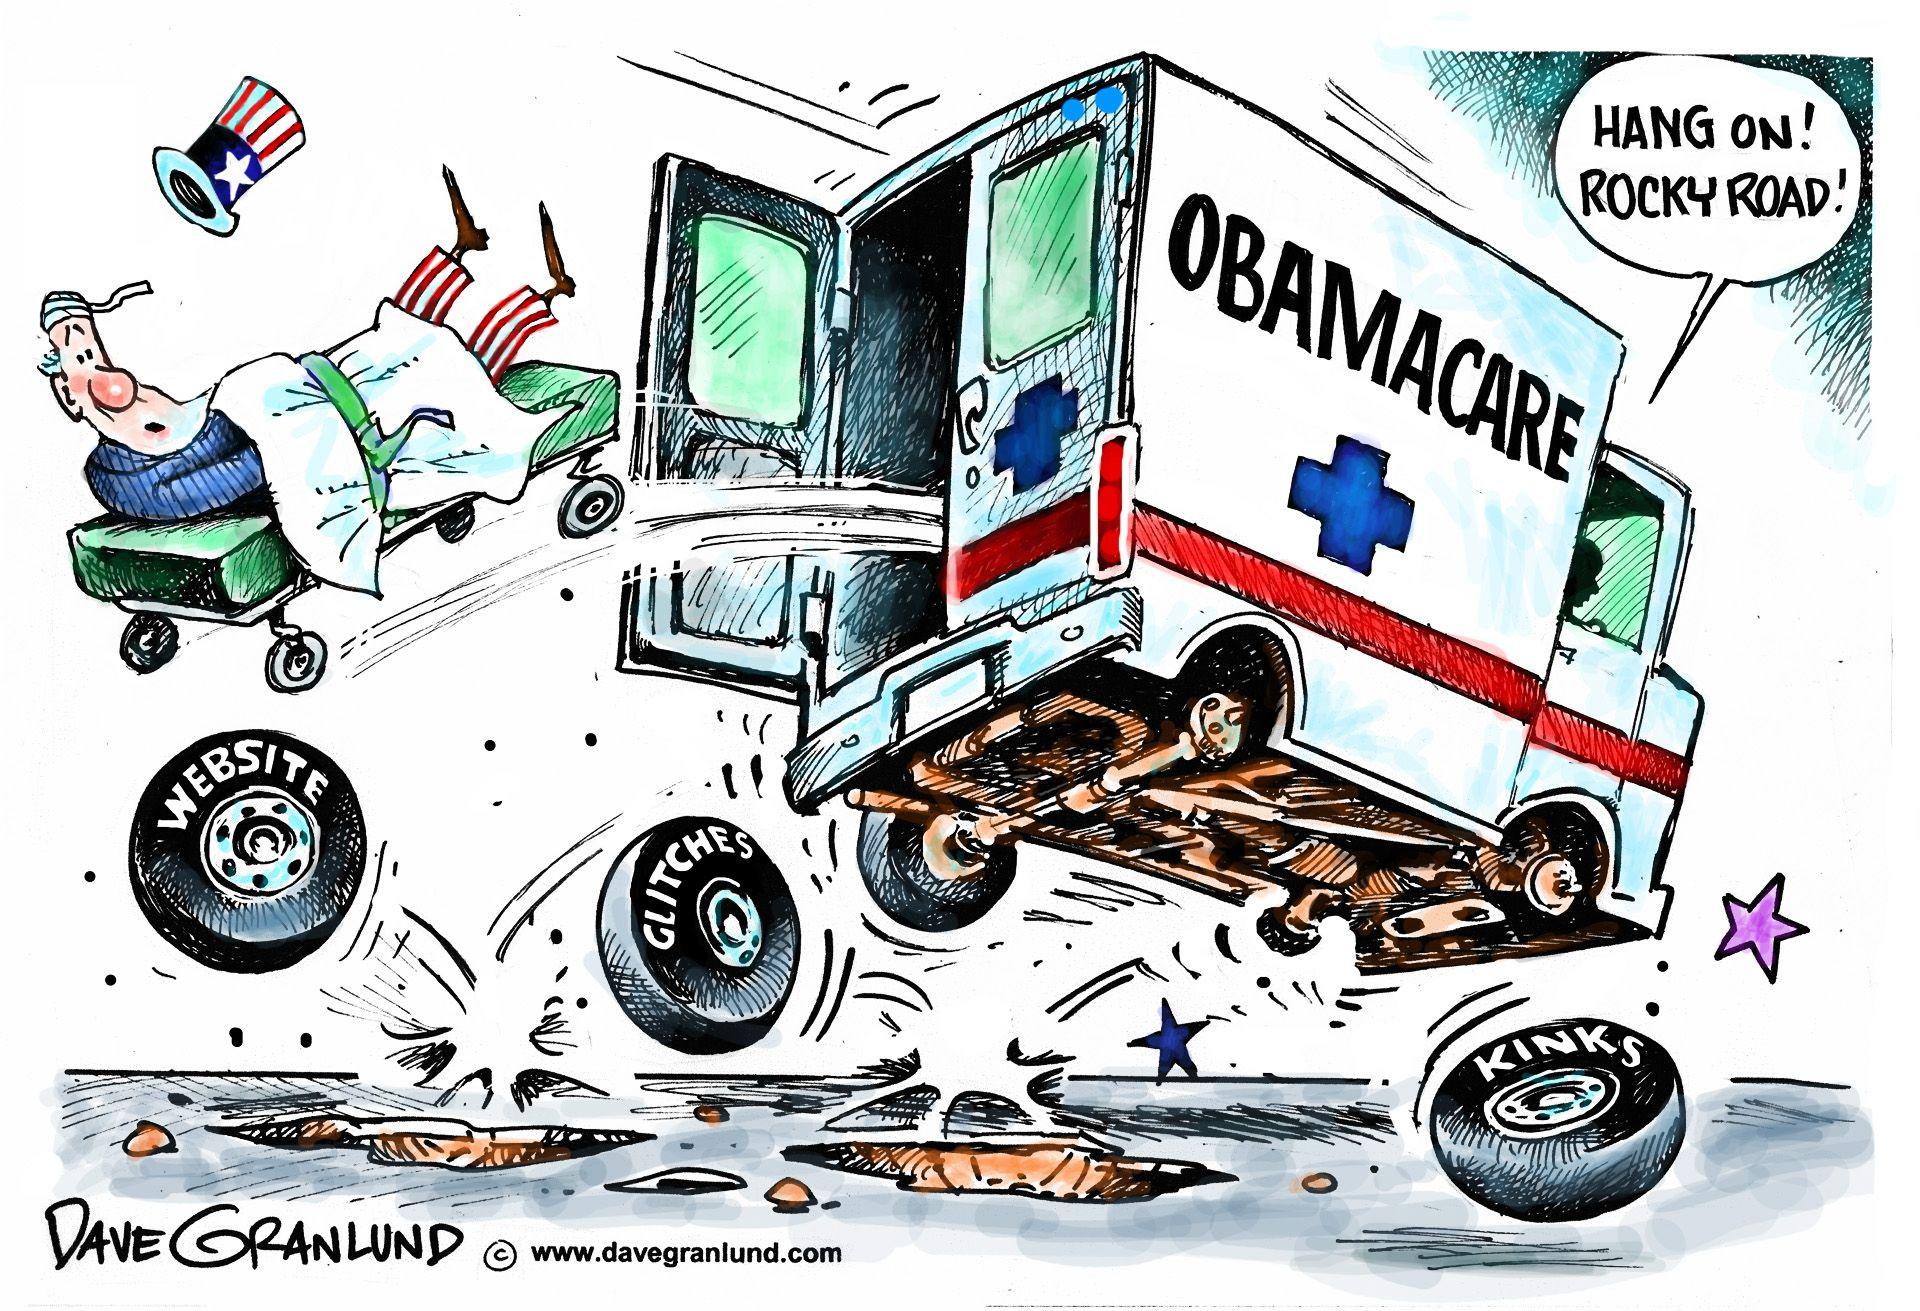 Dave Granlund on Obamacare's rocky start.